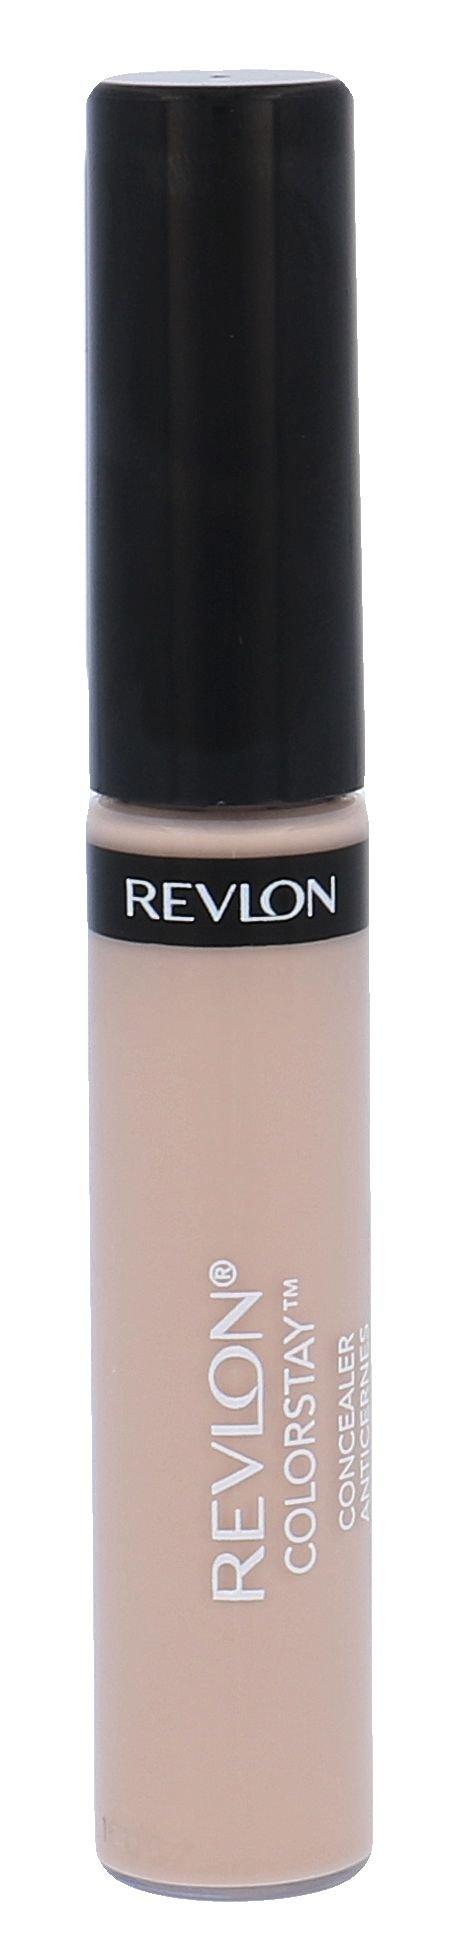 Revlon Colorstay Cosmetic 6,2ml 01 Fair